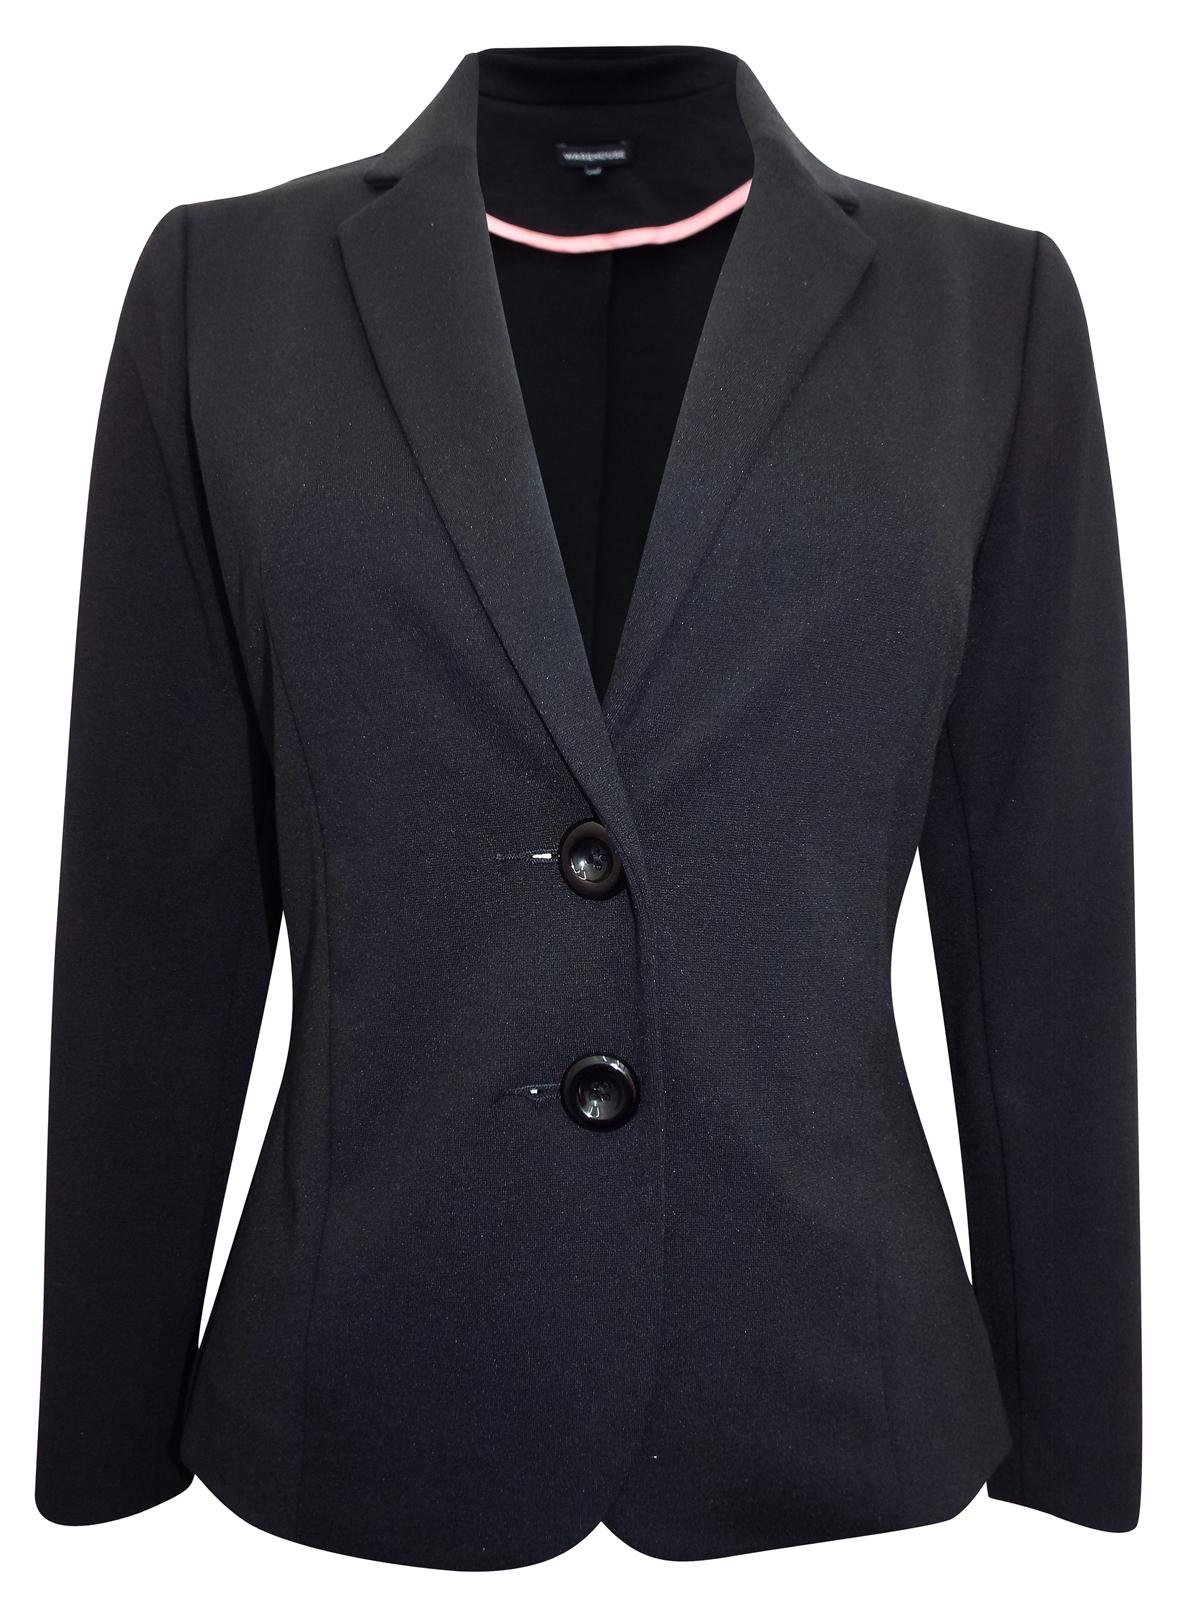 Short black jackets women